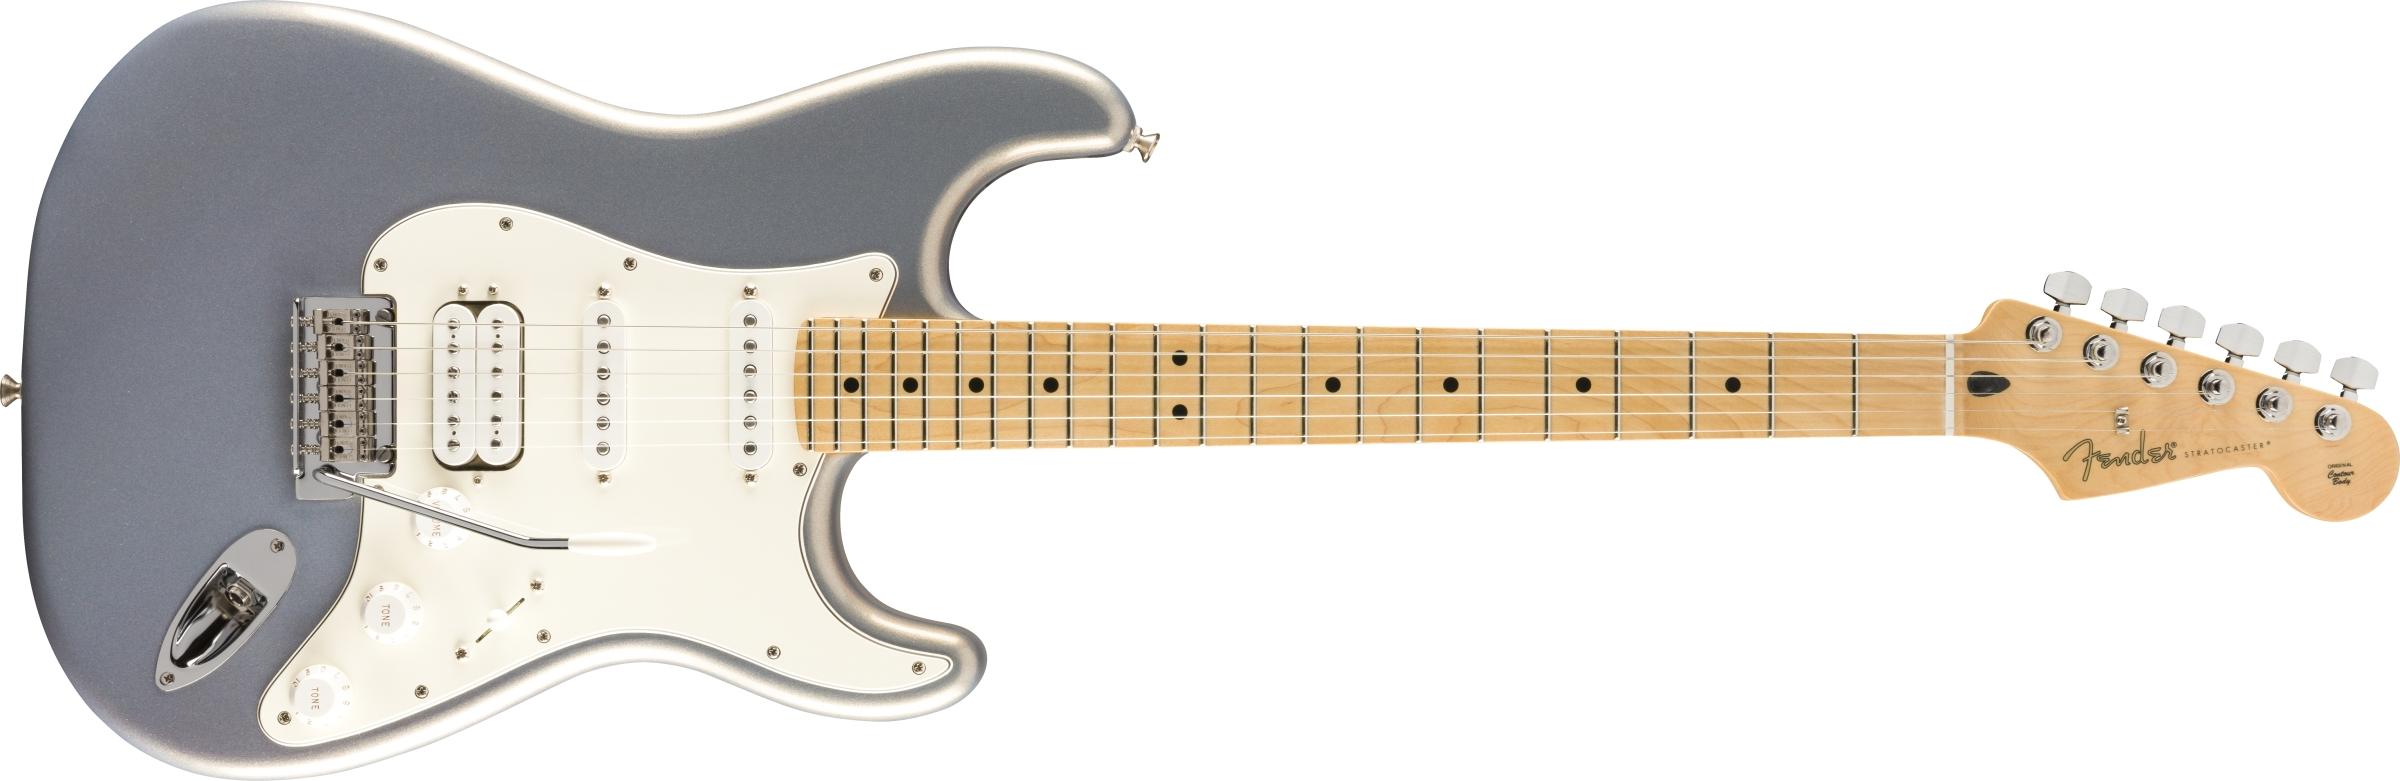 FENDER-Player-Stratocaster-HSS-MN-Silver-0144522581-sku-23732